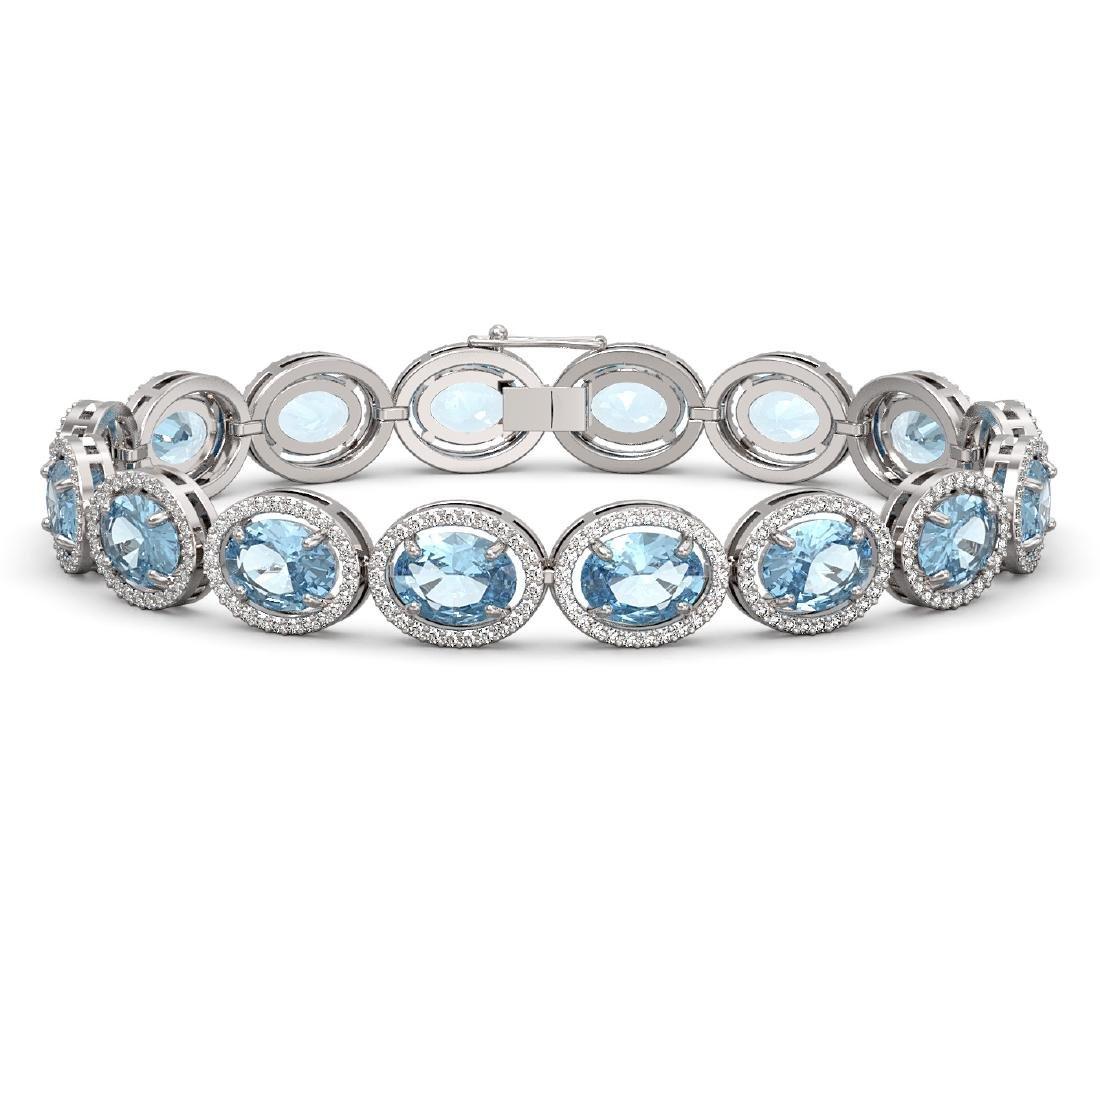 29.53 CTW Sky Topaz & Diamond Halo Bracelet 10K White